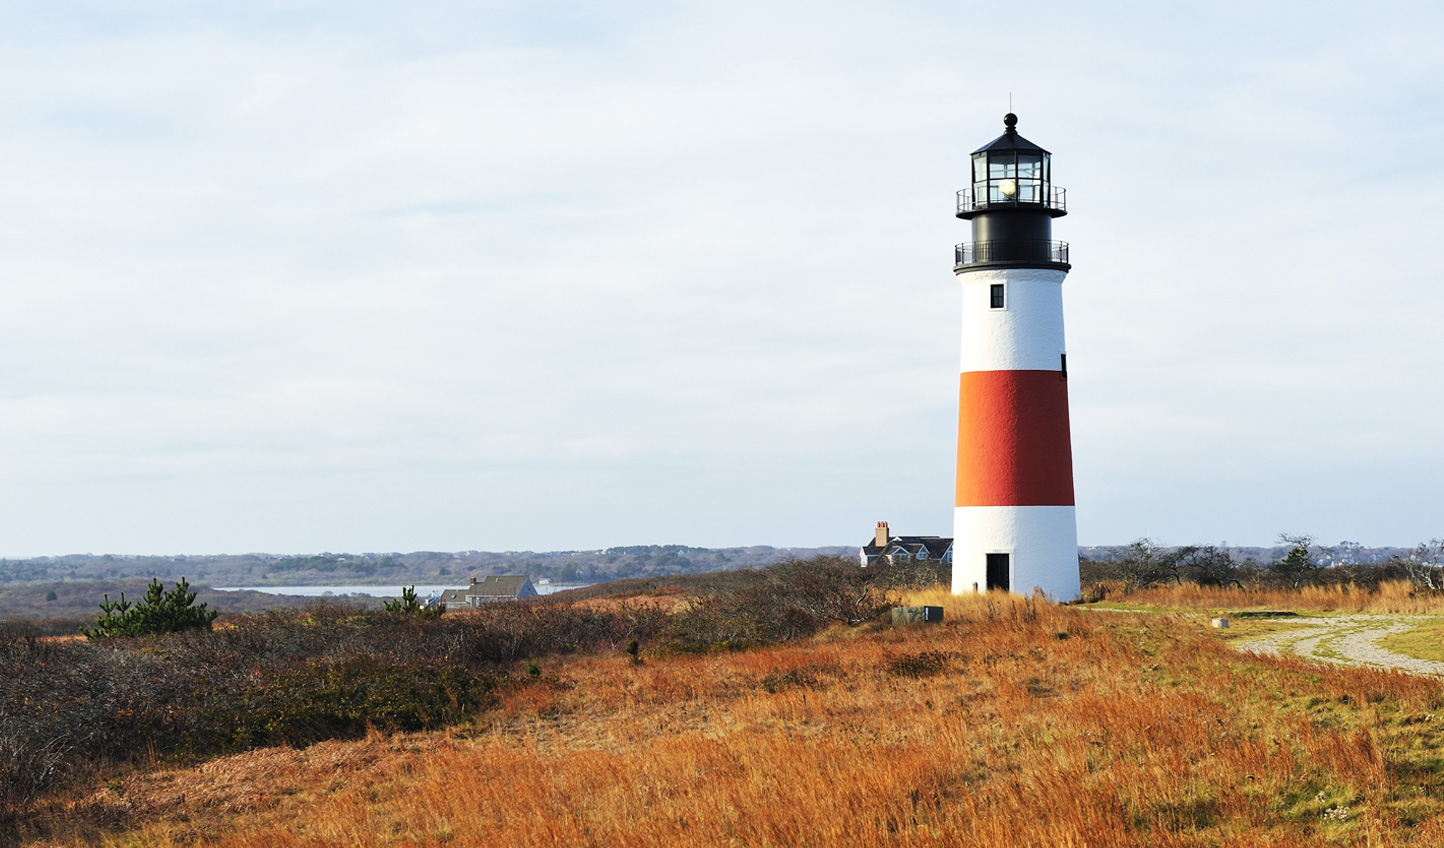 The Sankaty Head Lighthouse on the eastern shore of Nantucket Island